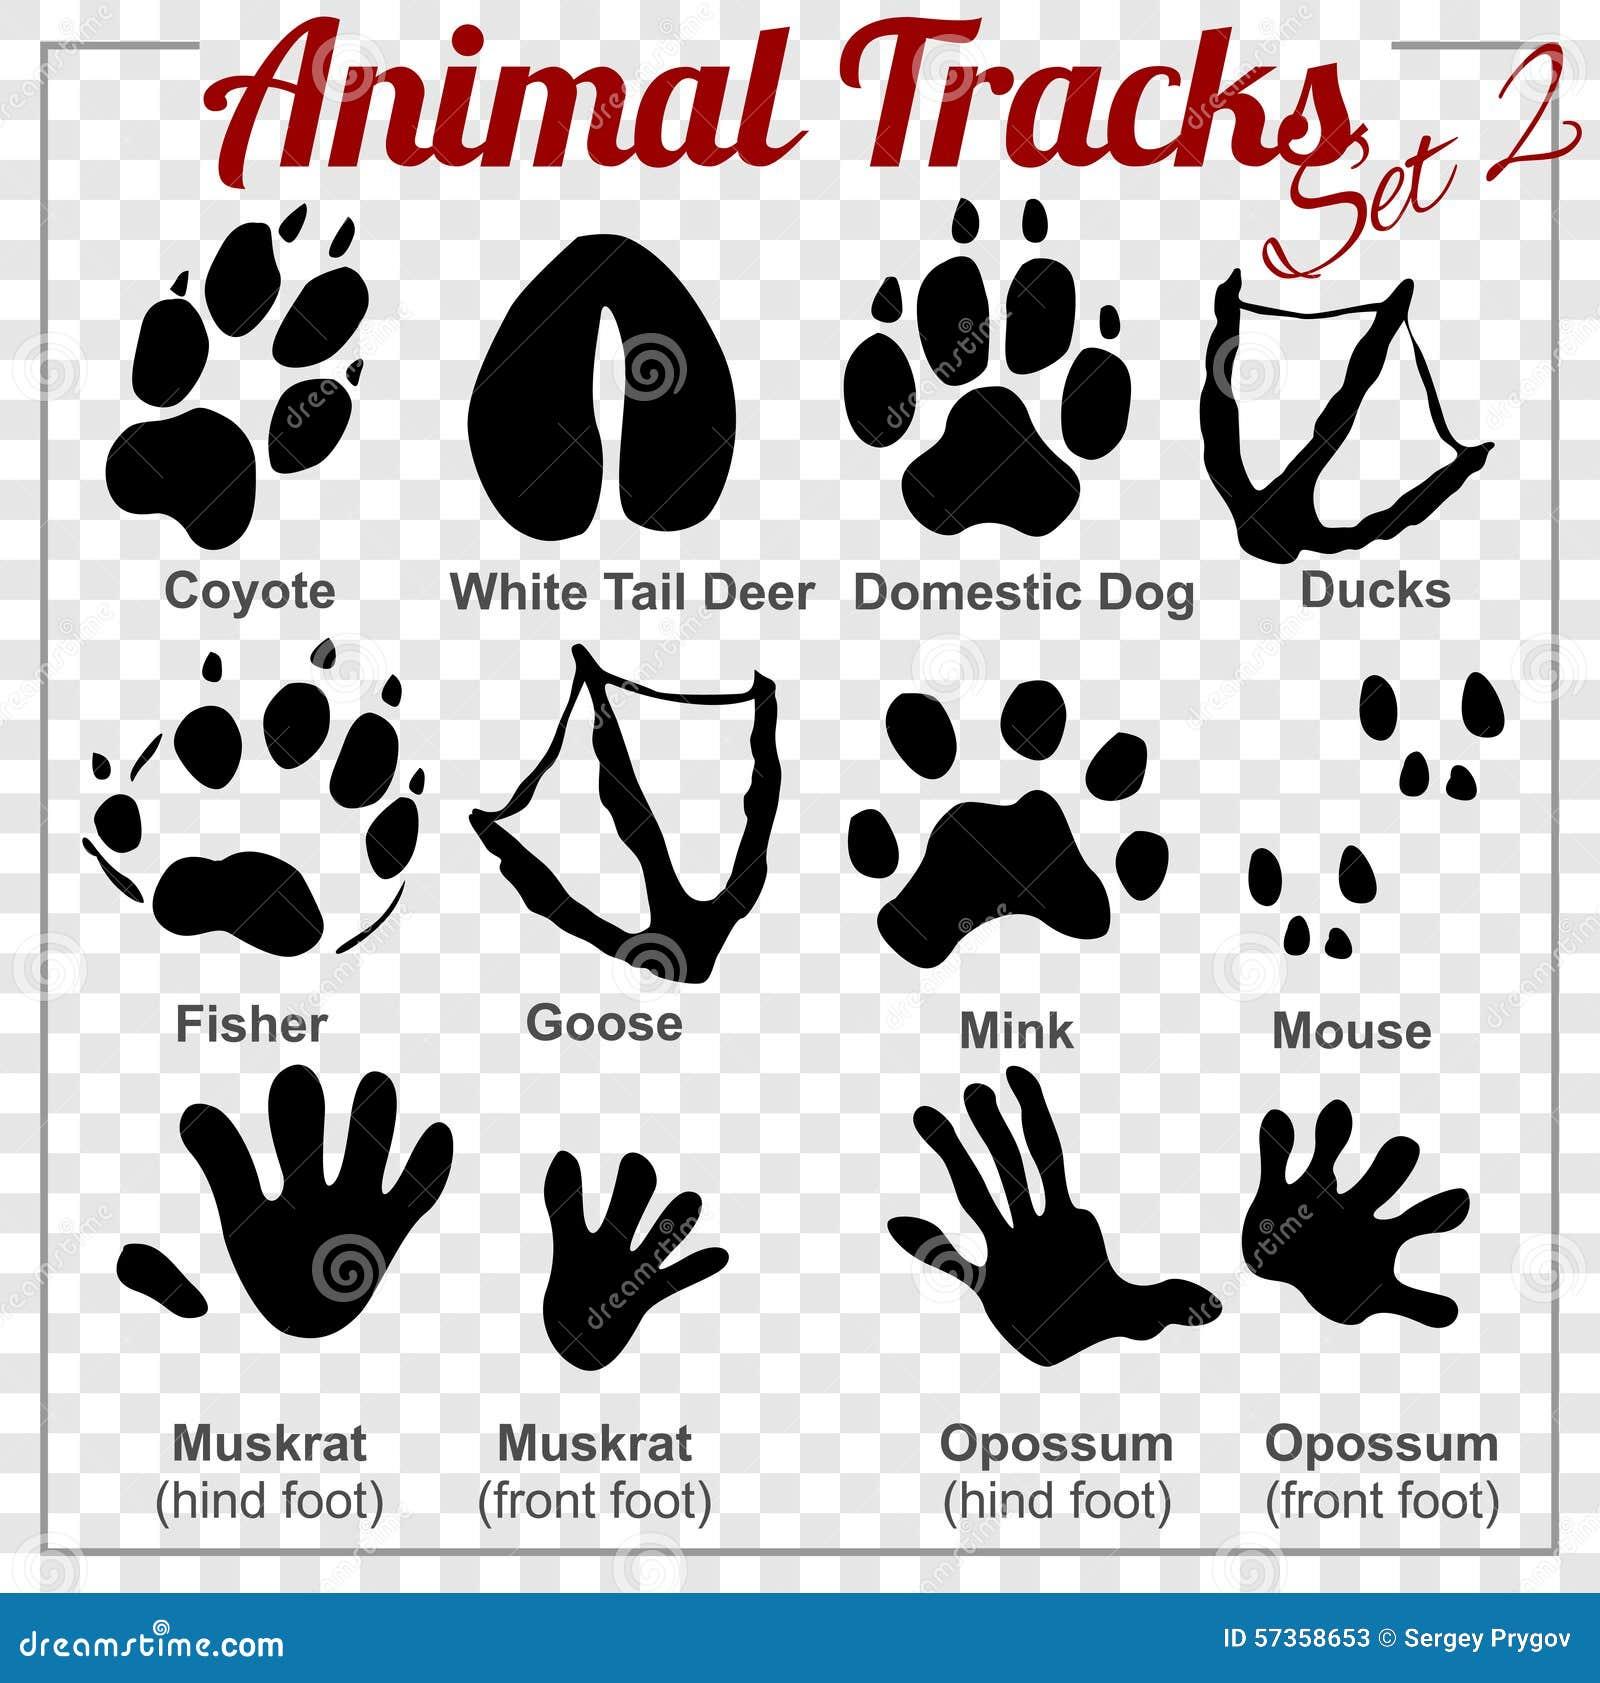 Animals Tracks - Vector Set Stock Vector - Image: 57358653